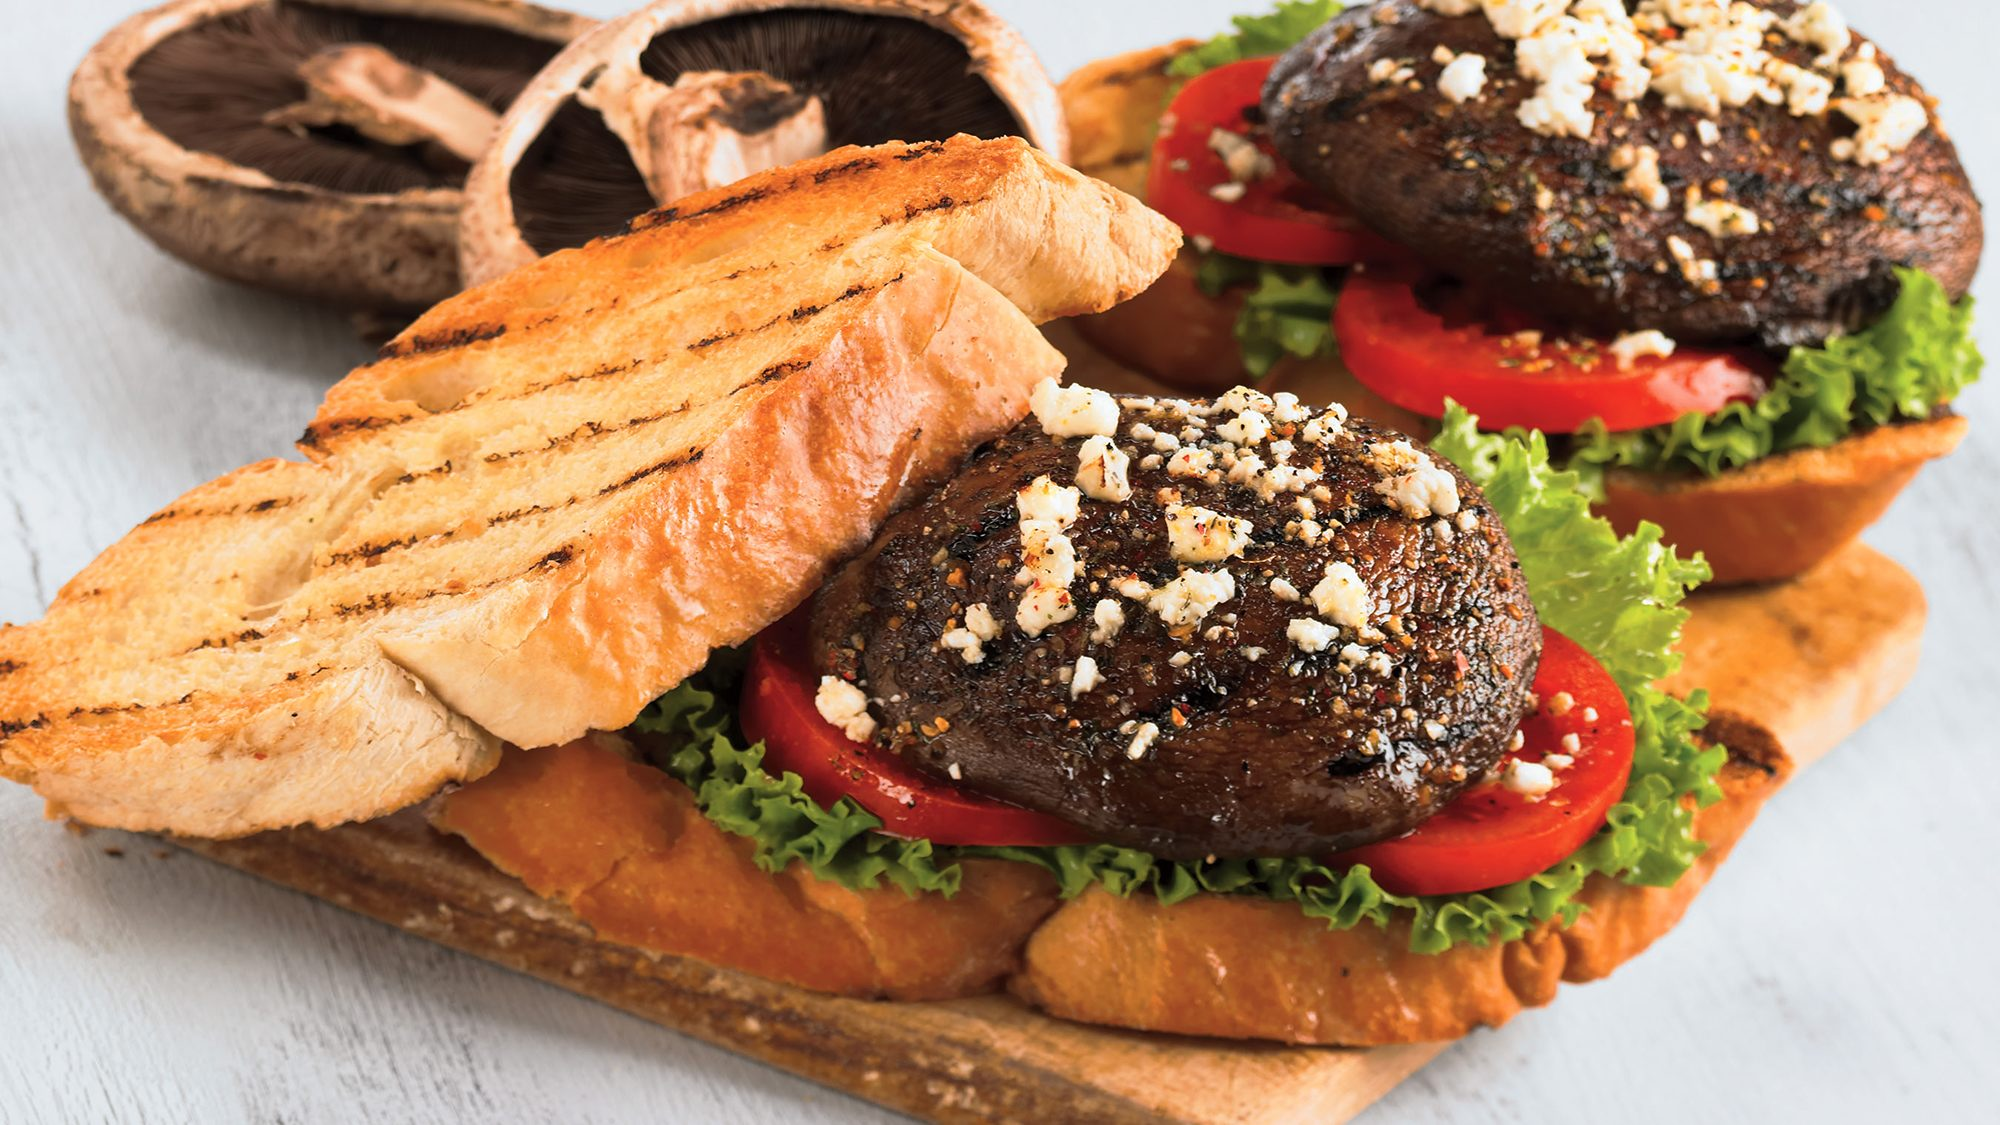 McCormick Grill Mates Grilled Portobello Mushroom Panini